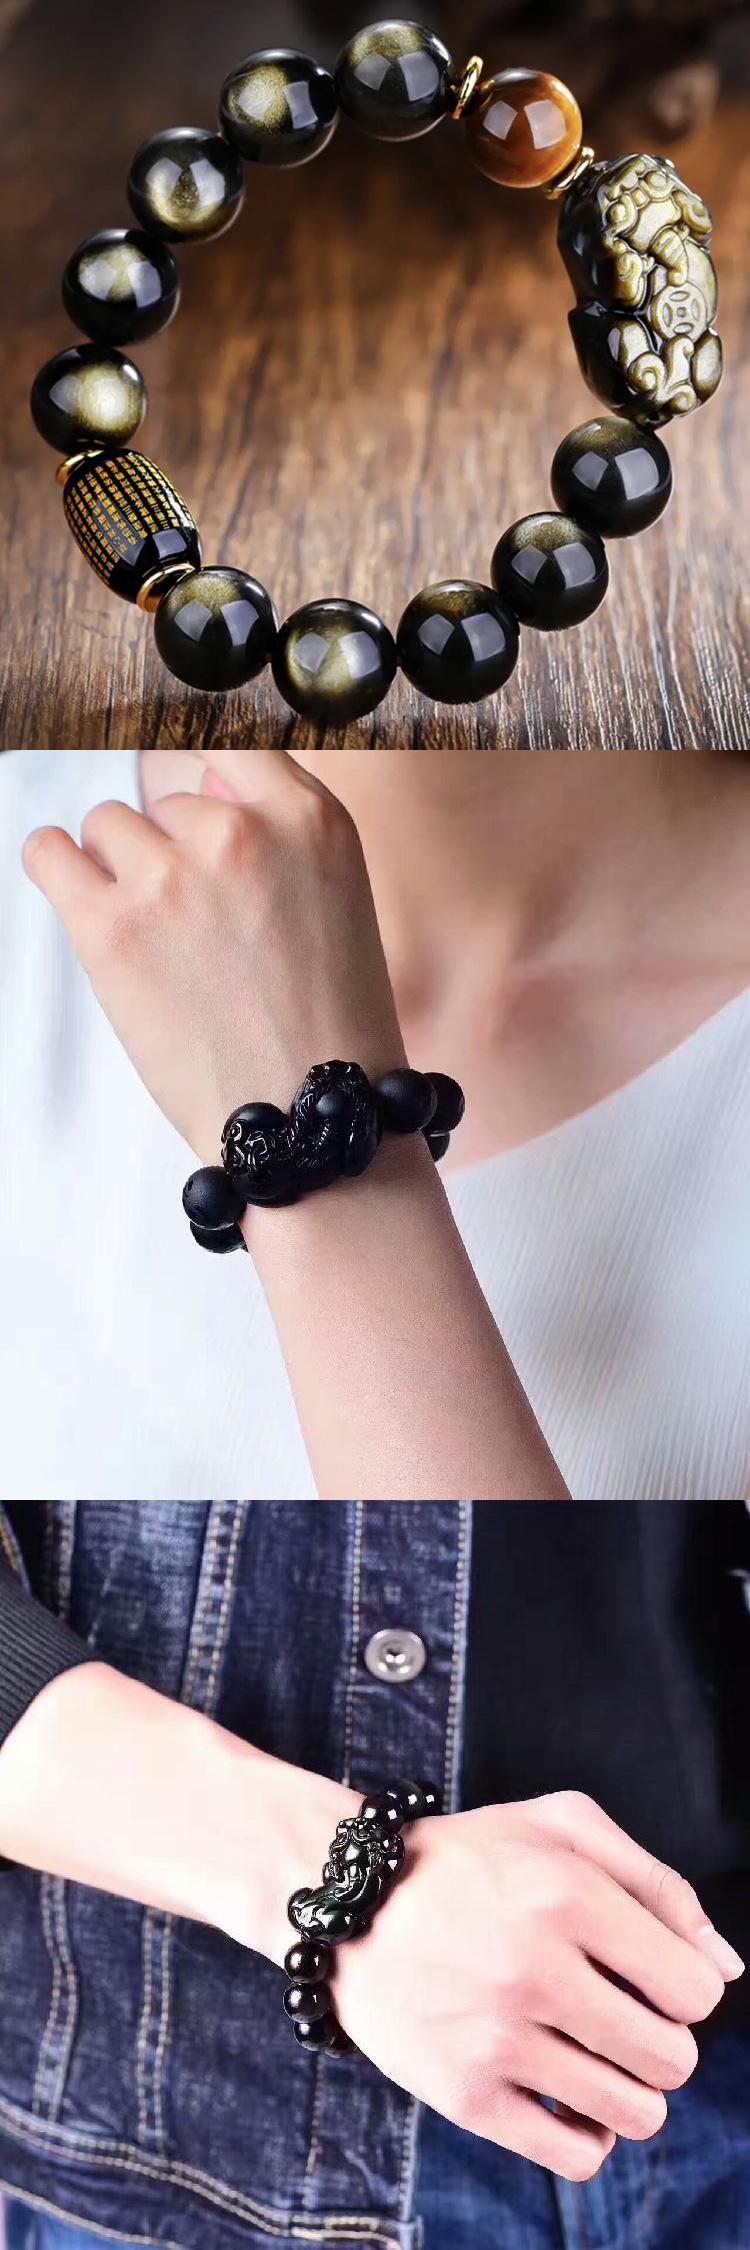 Box gift rose valentines day bracelets bangles jewelry charm fengshui obsidian pixiu bracelet mens